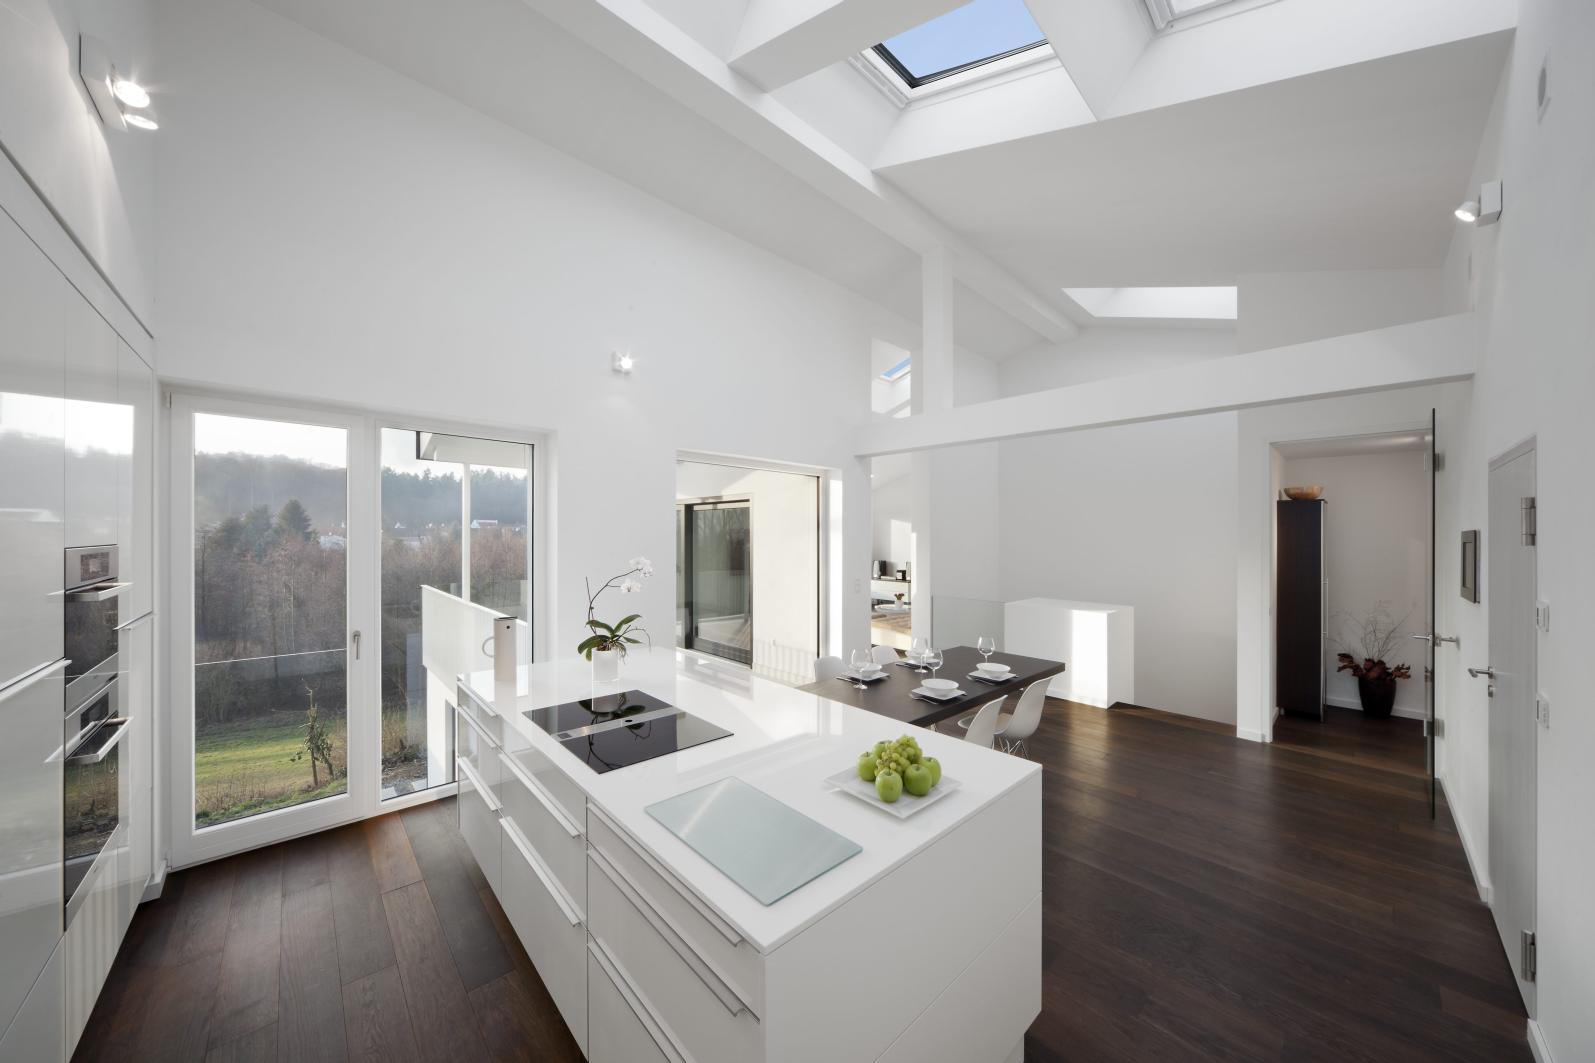 k che mit hoher decke. Black Bedroom Furniture Sets. Home Design Ideas